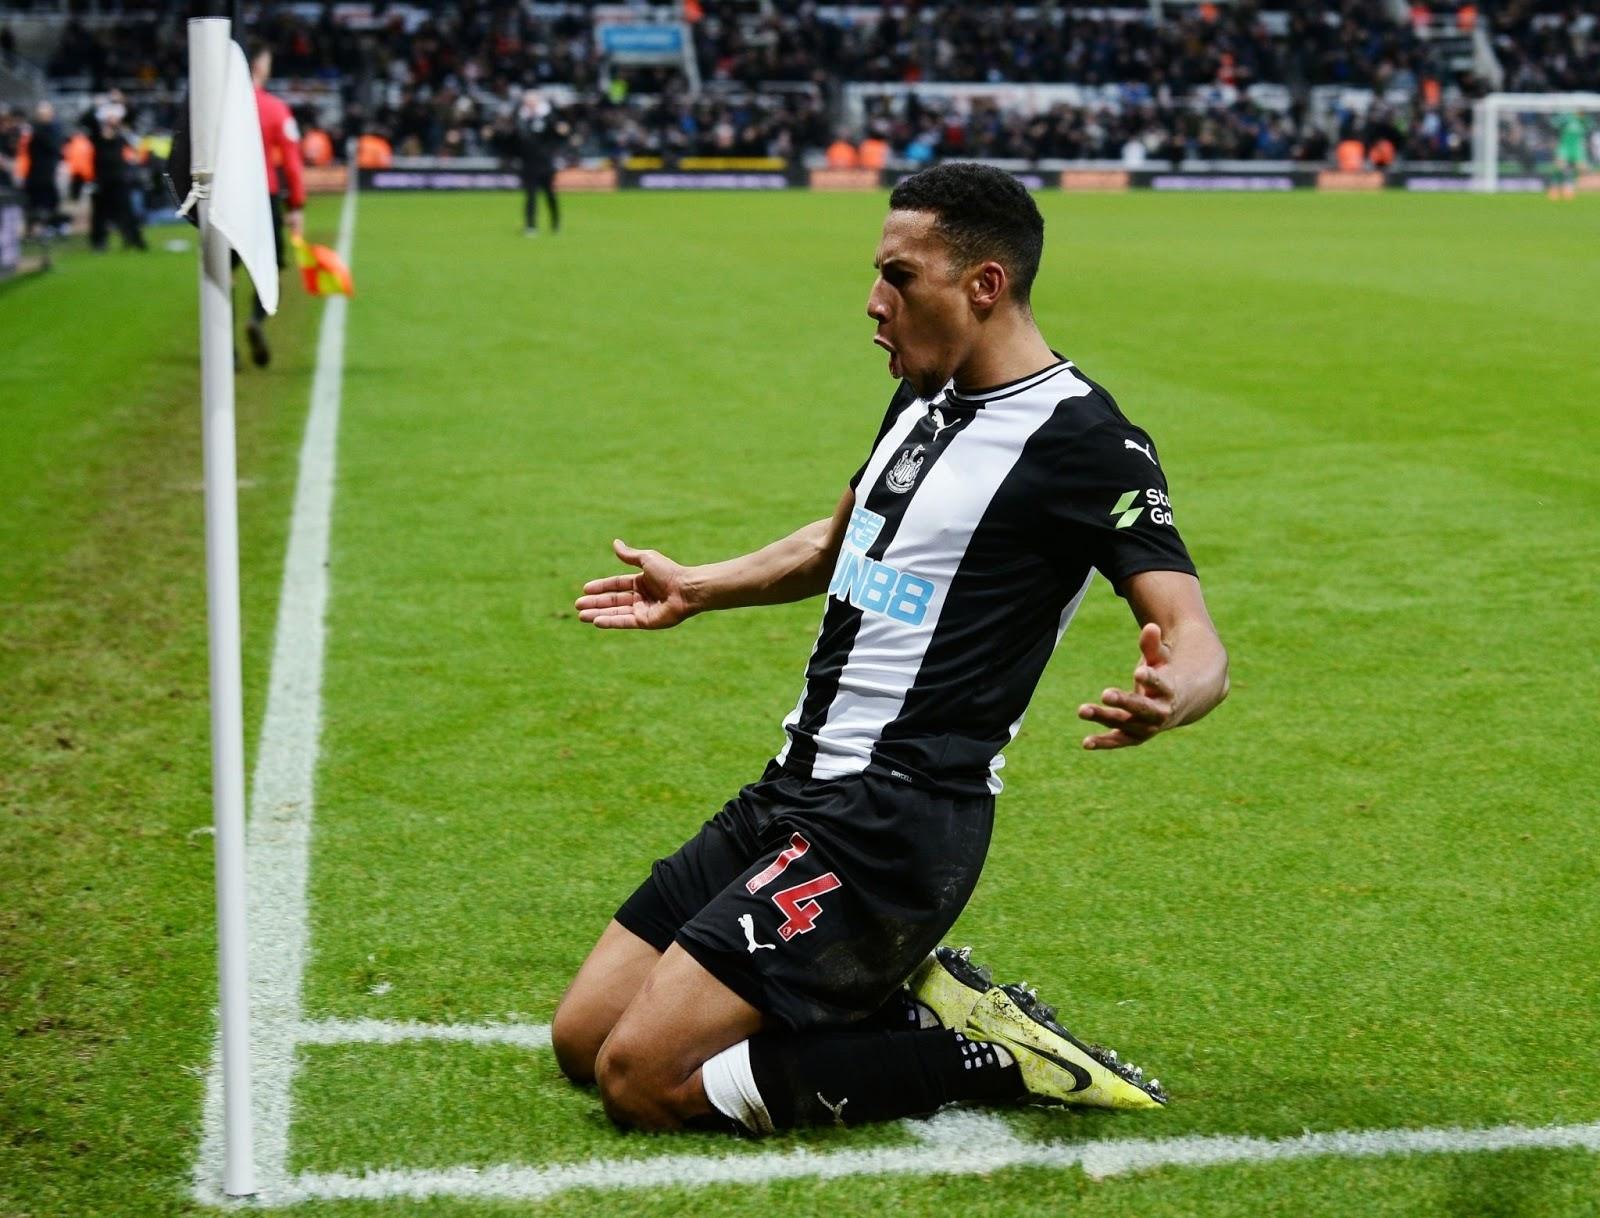 Newcastle 1-0 Chelsea: Late goal ends Blues unbeaten run as James off injured